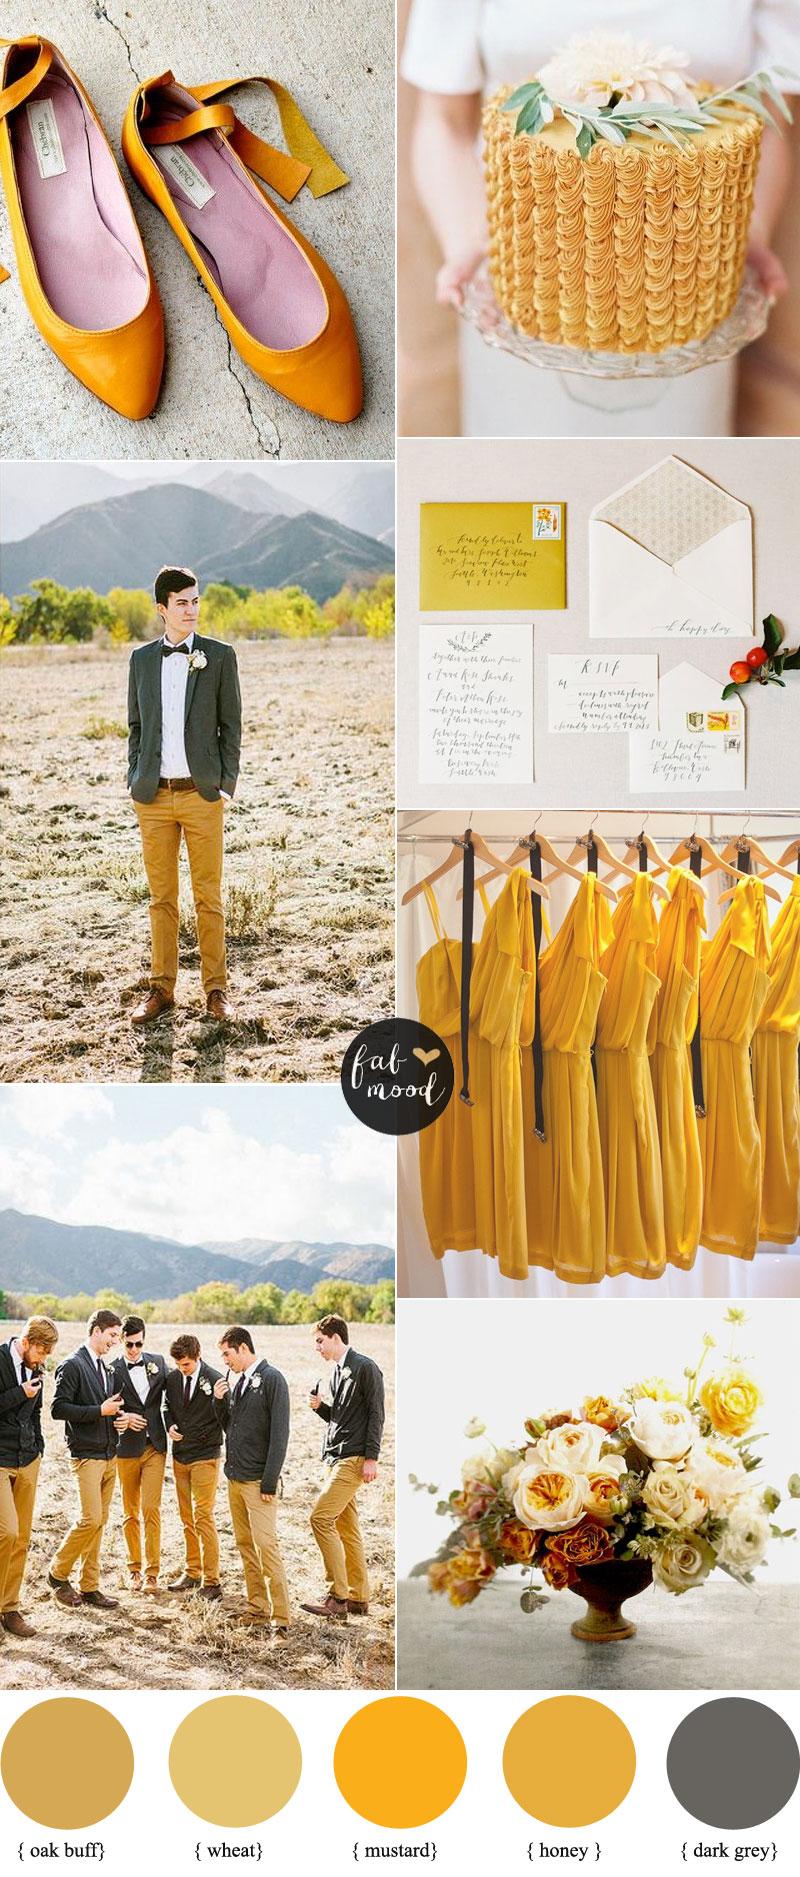 oak buff mustard autumn wedding colours pantone fall 2015 inspired